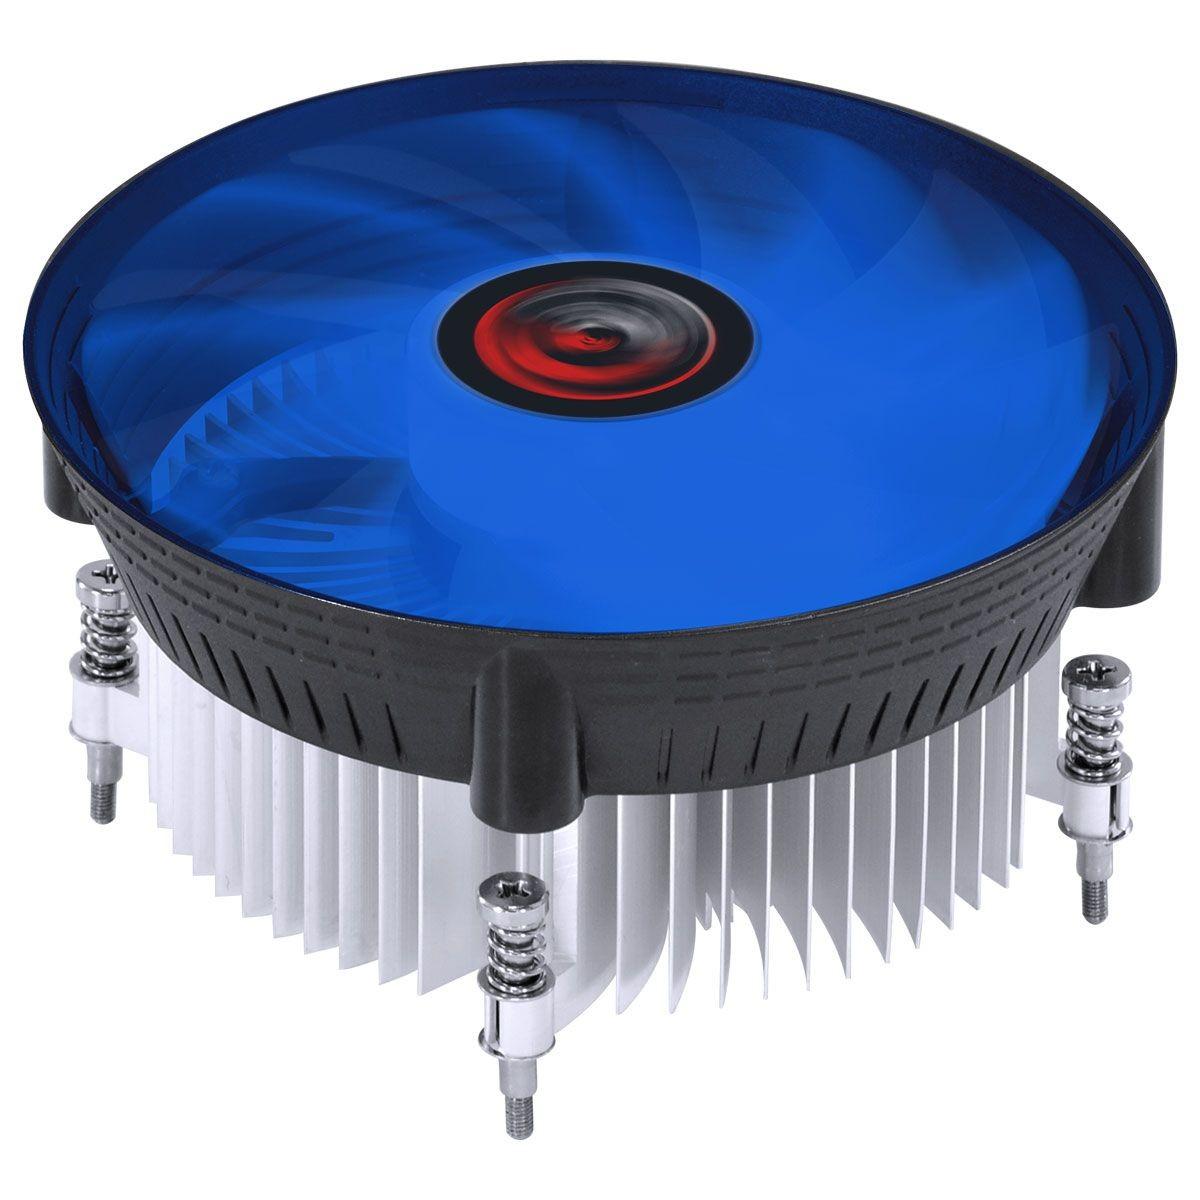 Cooler para Processador Pcyes Nótus I300, Led Blue, 120mm, Intel, PAC120PRLA